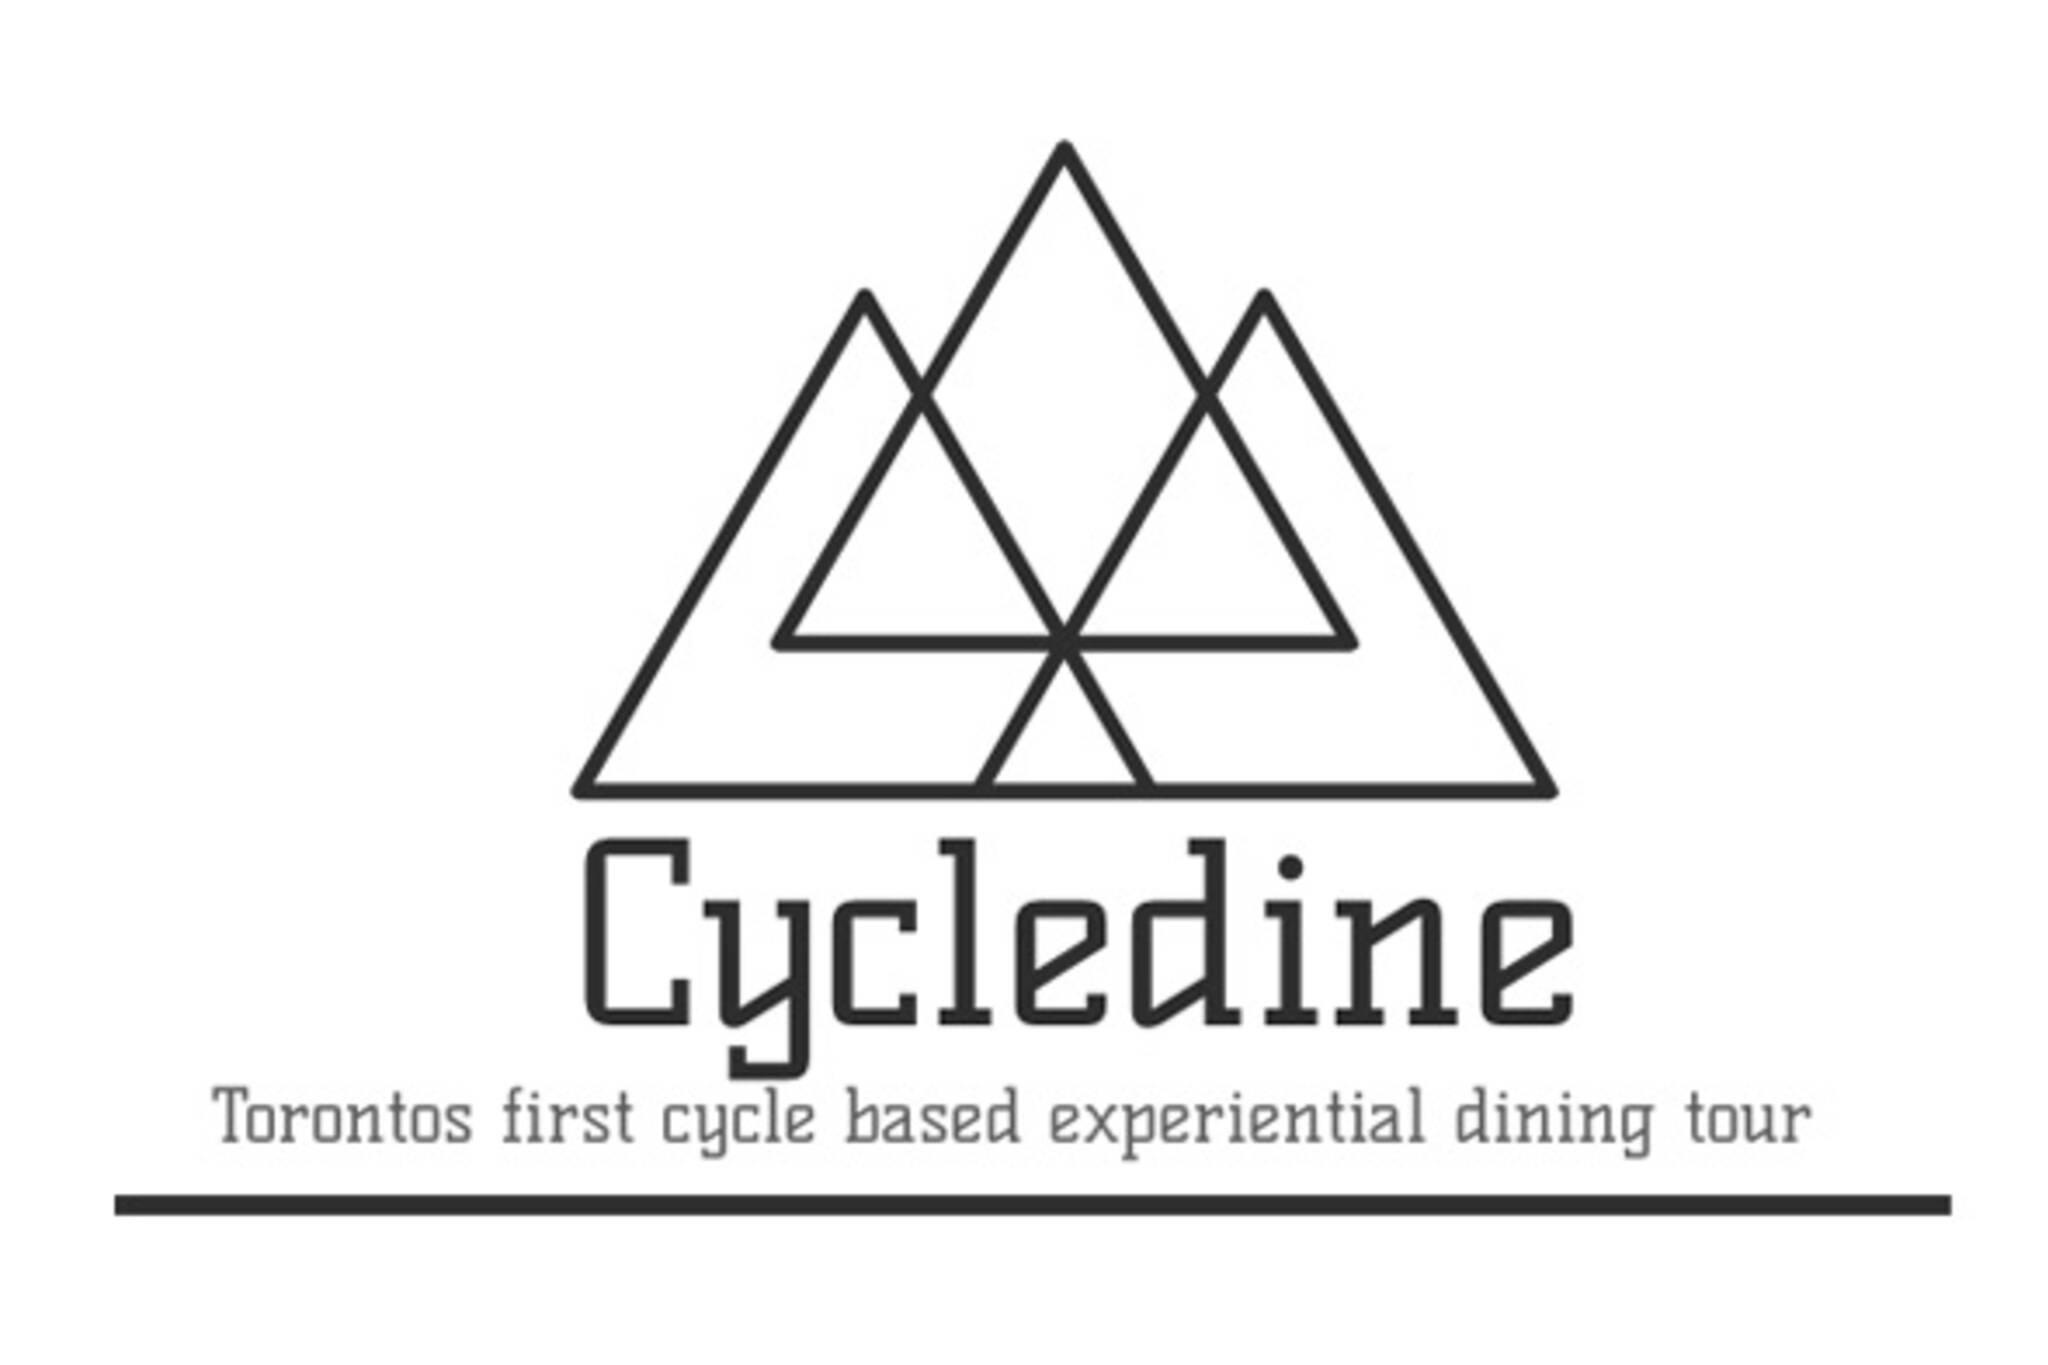 cycledine